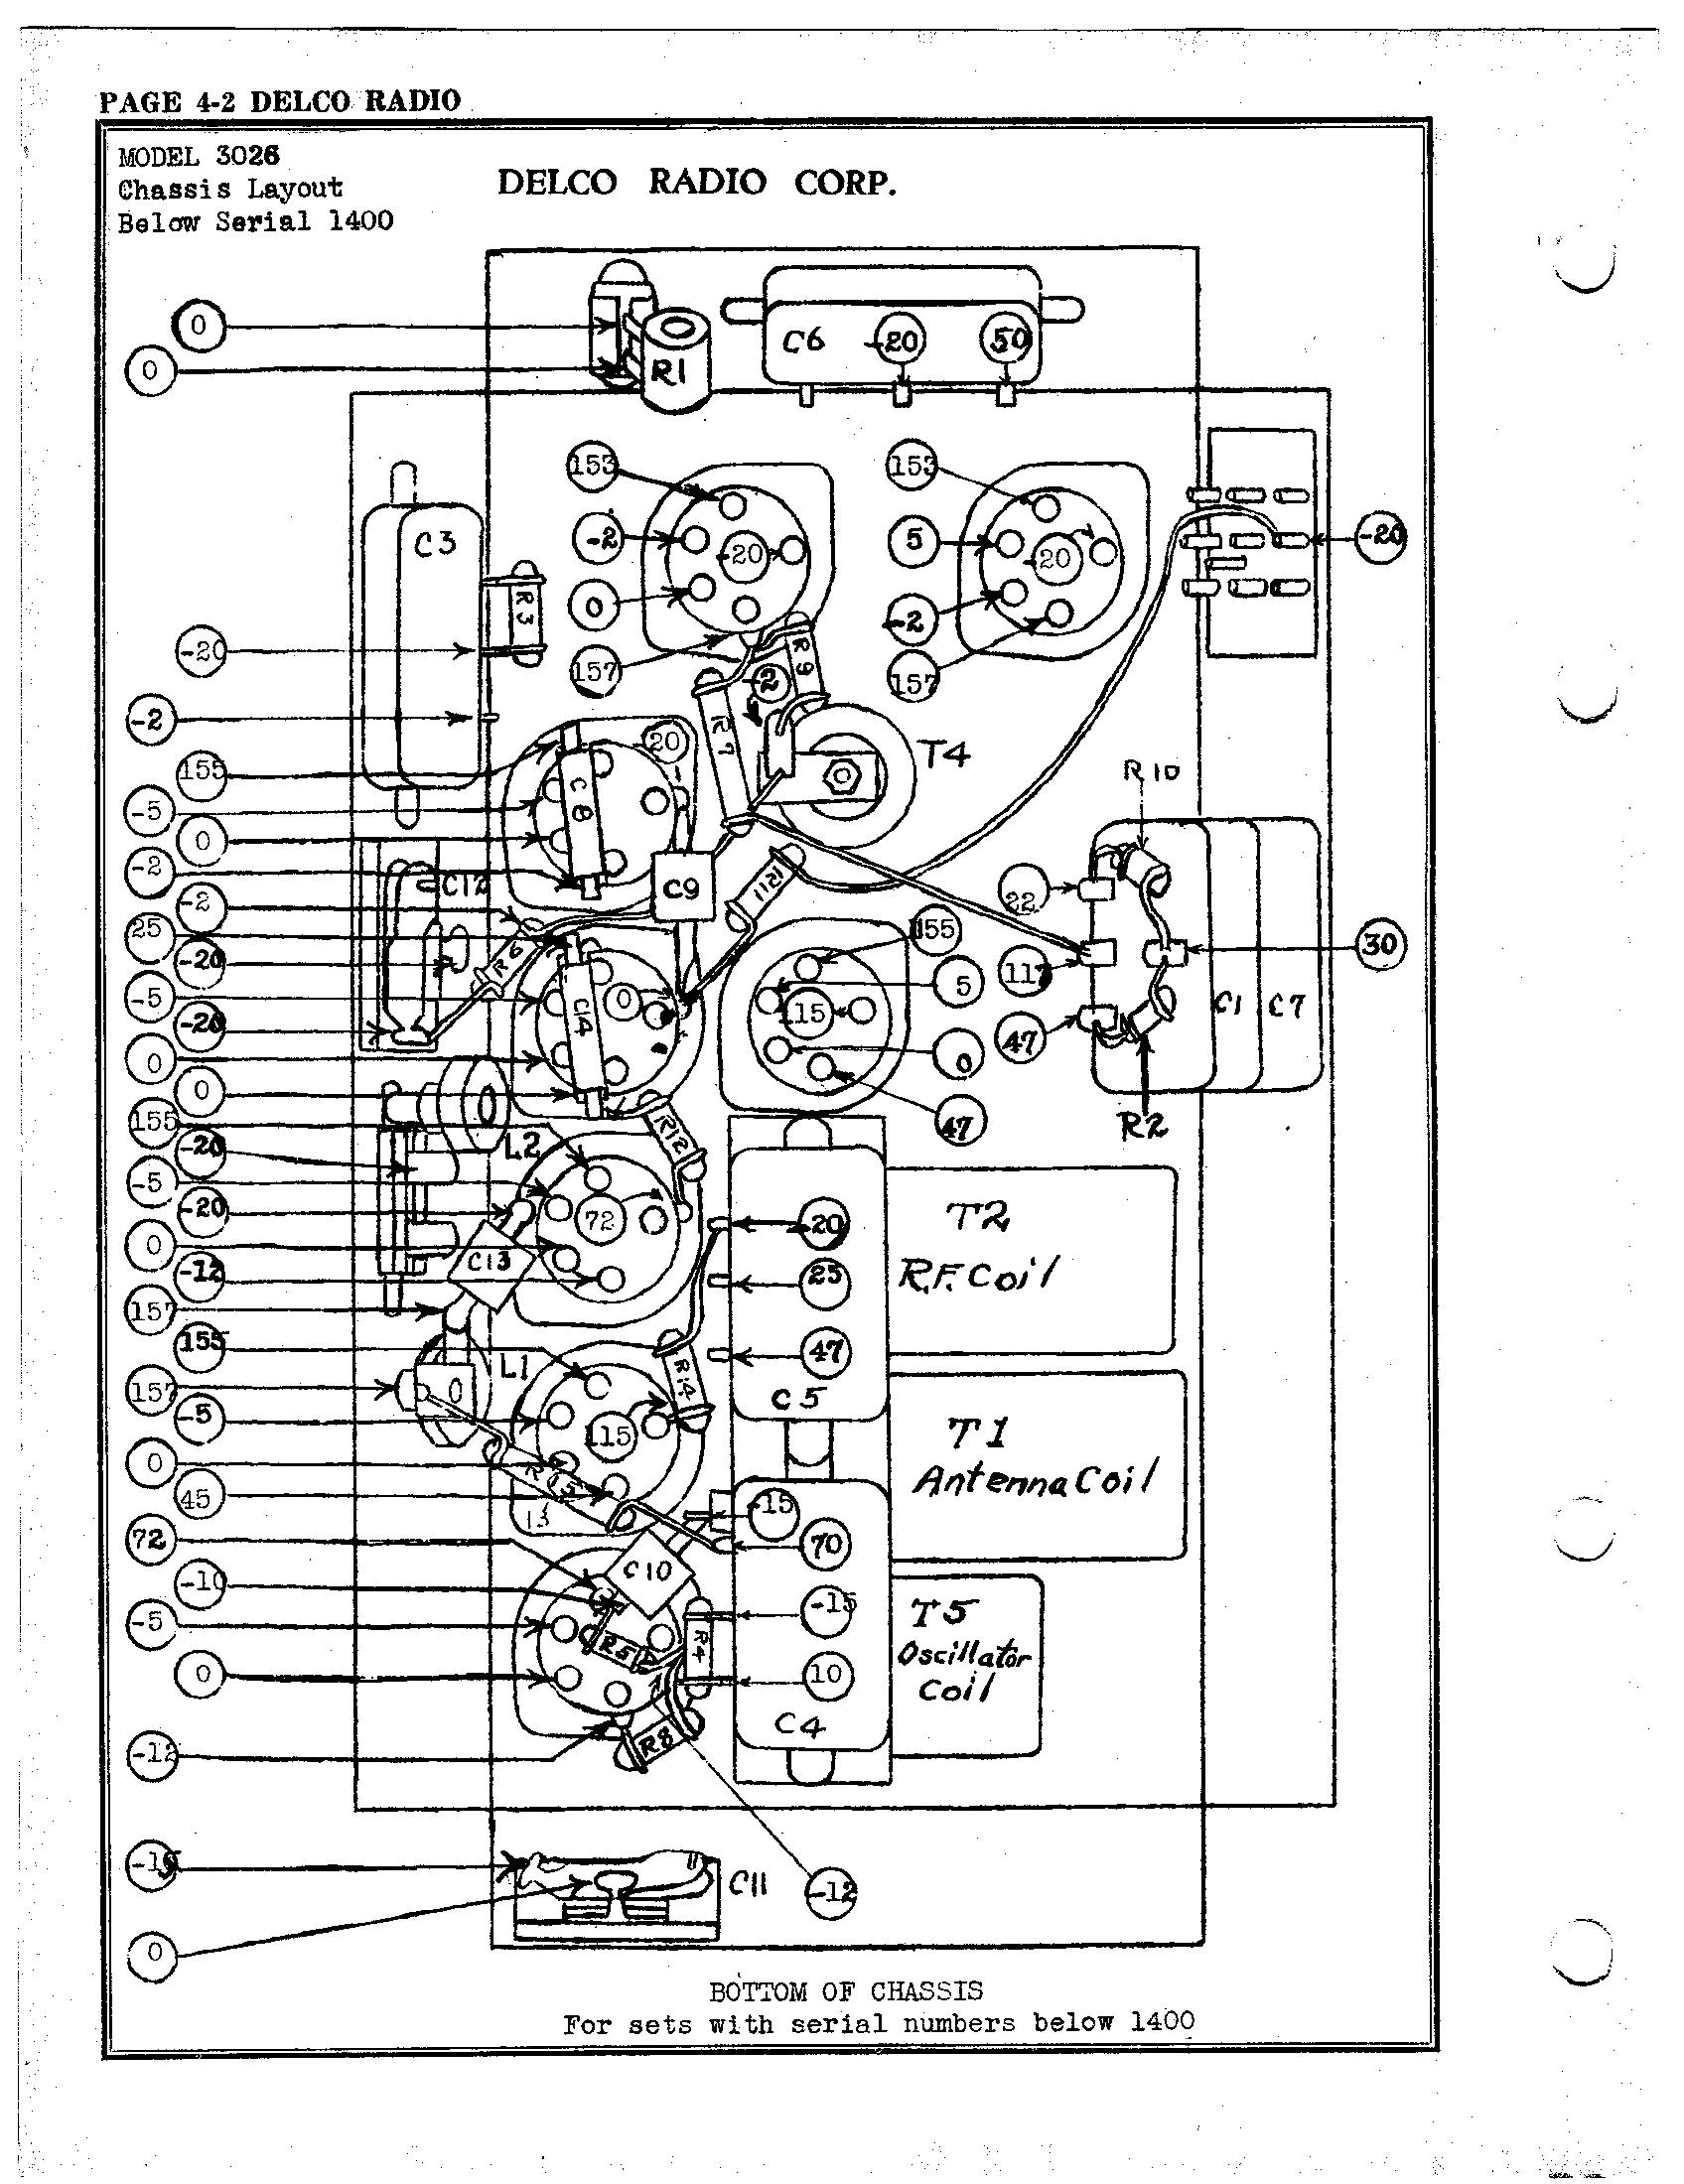 delco radio wiring diagram 1997 ford f150 model 16213825 basketball court